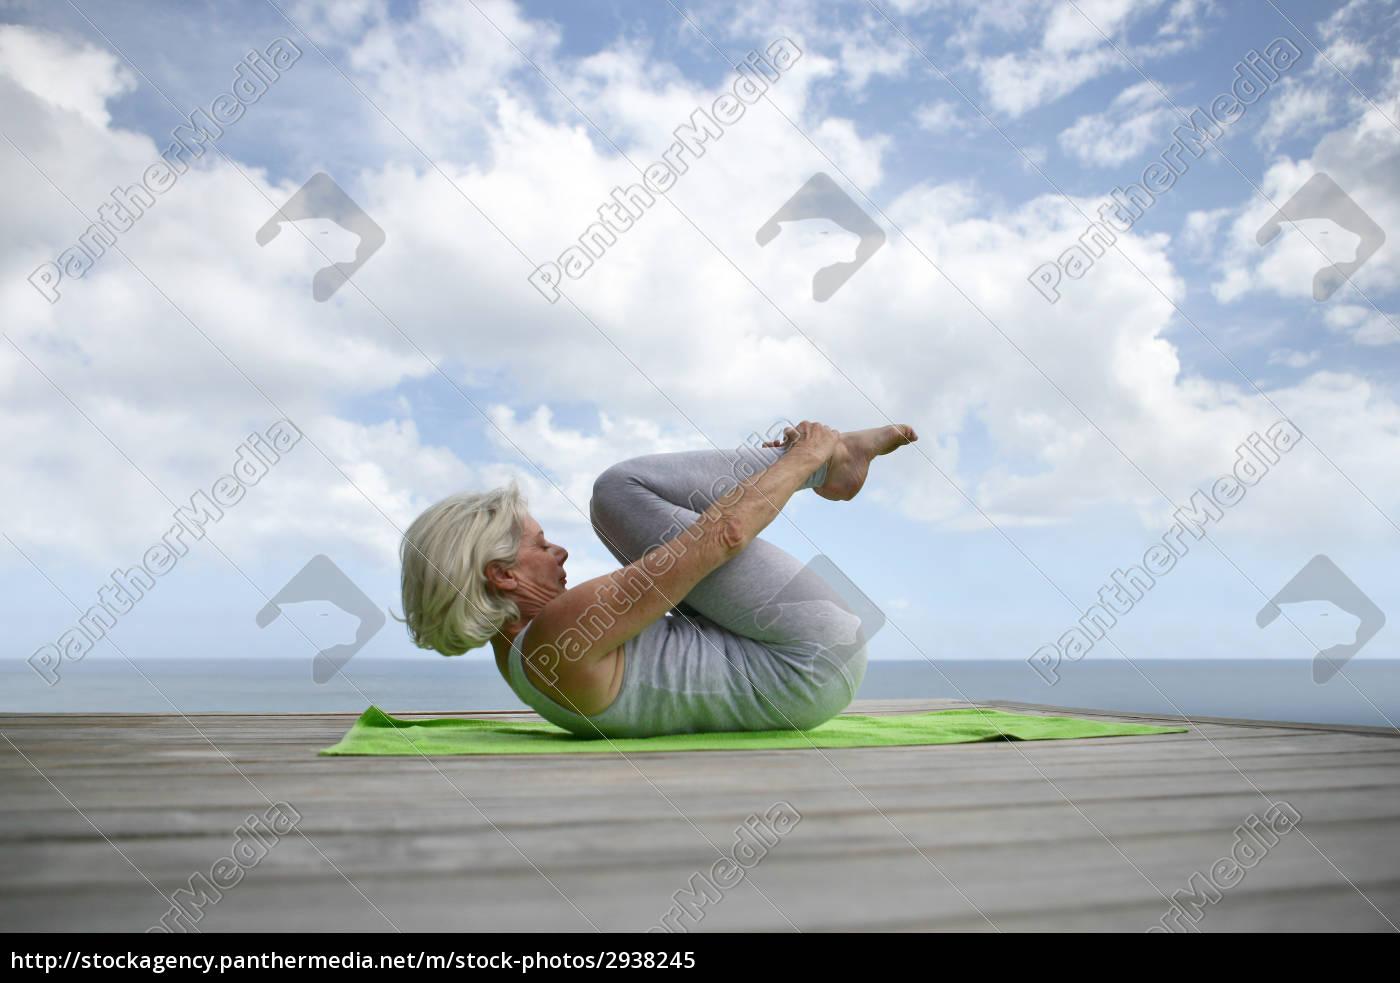 elderly, woman, doing, gymnastics, on, a - 2938245